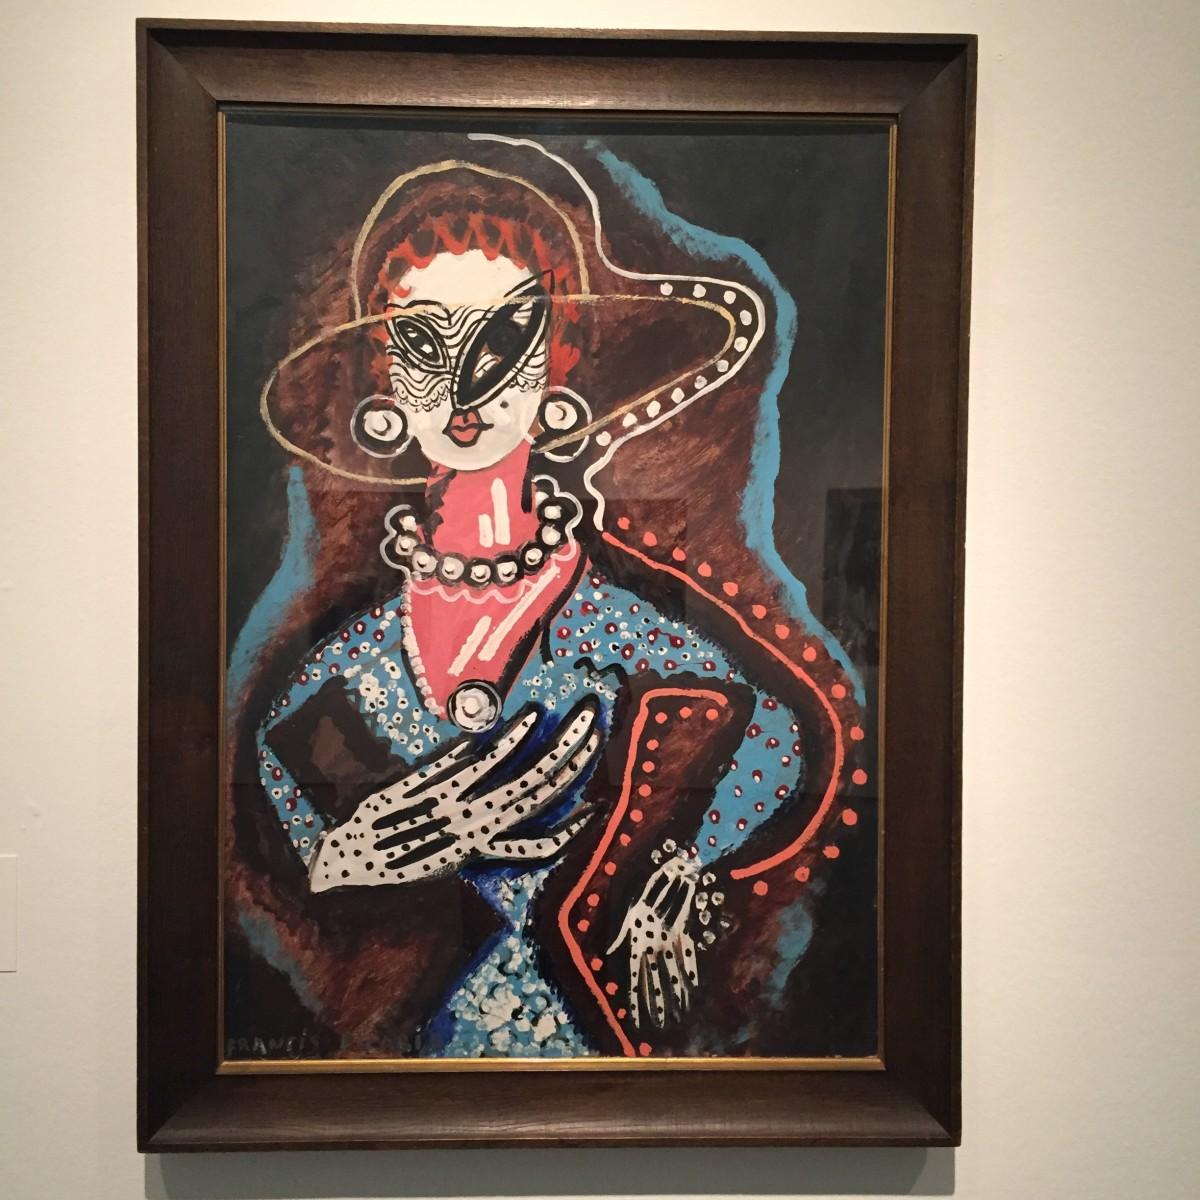 Francis Picabia - A Retrospective